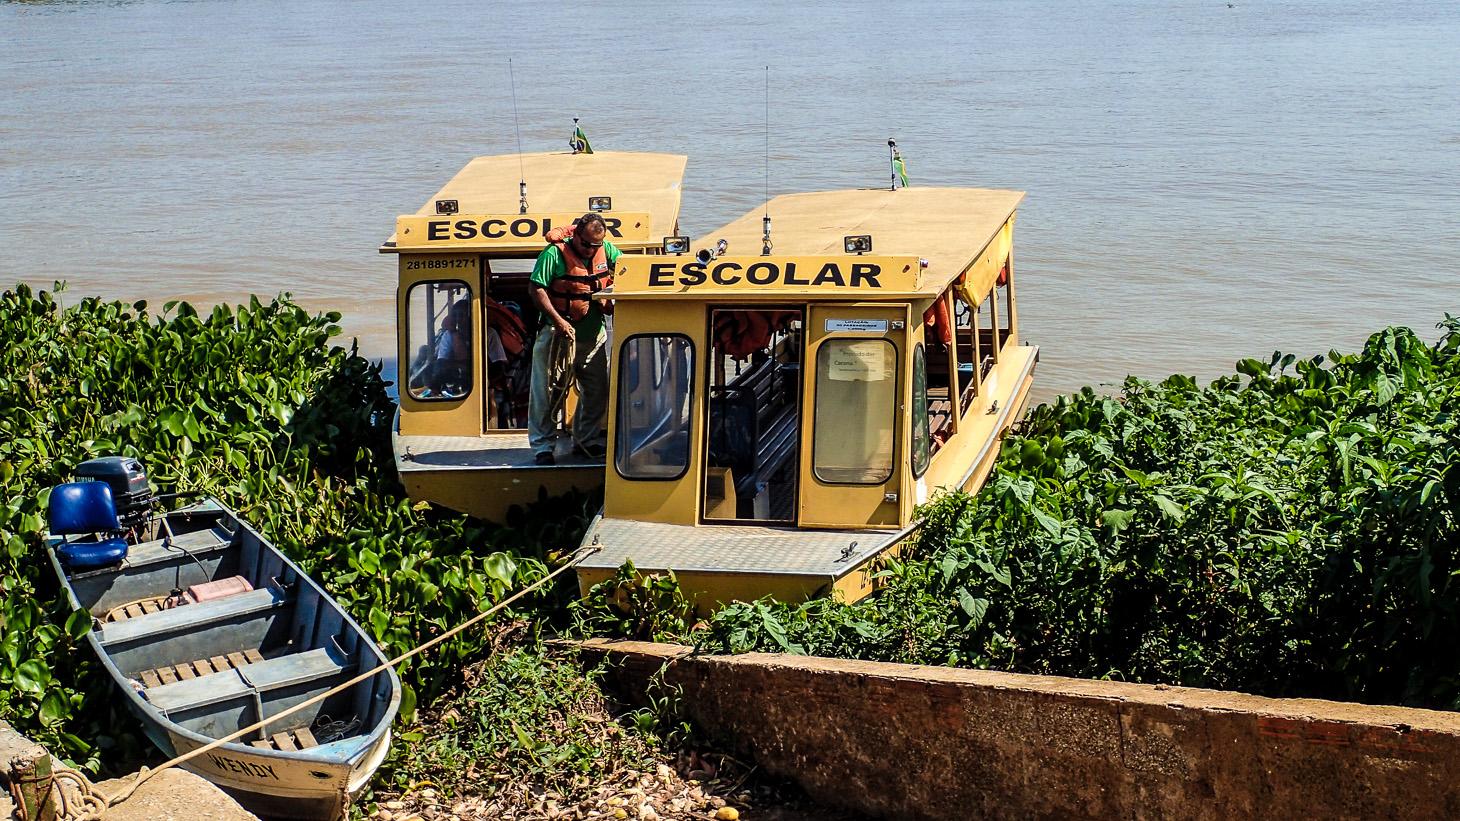 Školní bus, teda loď.